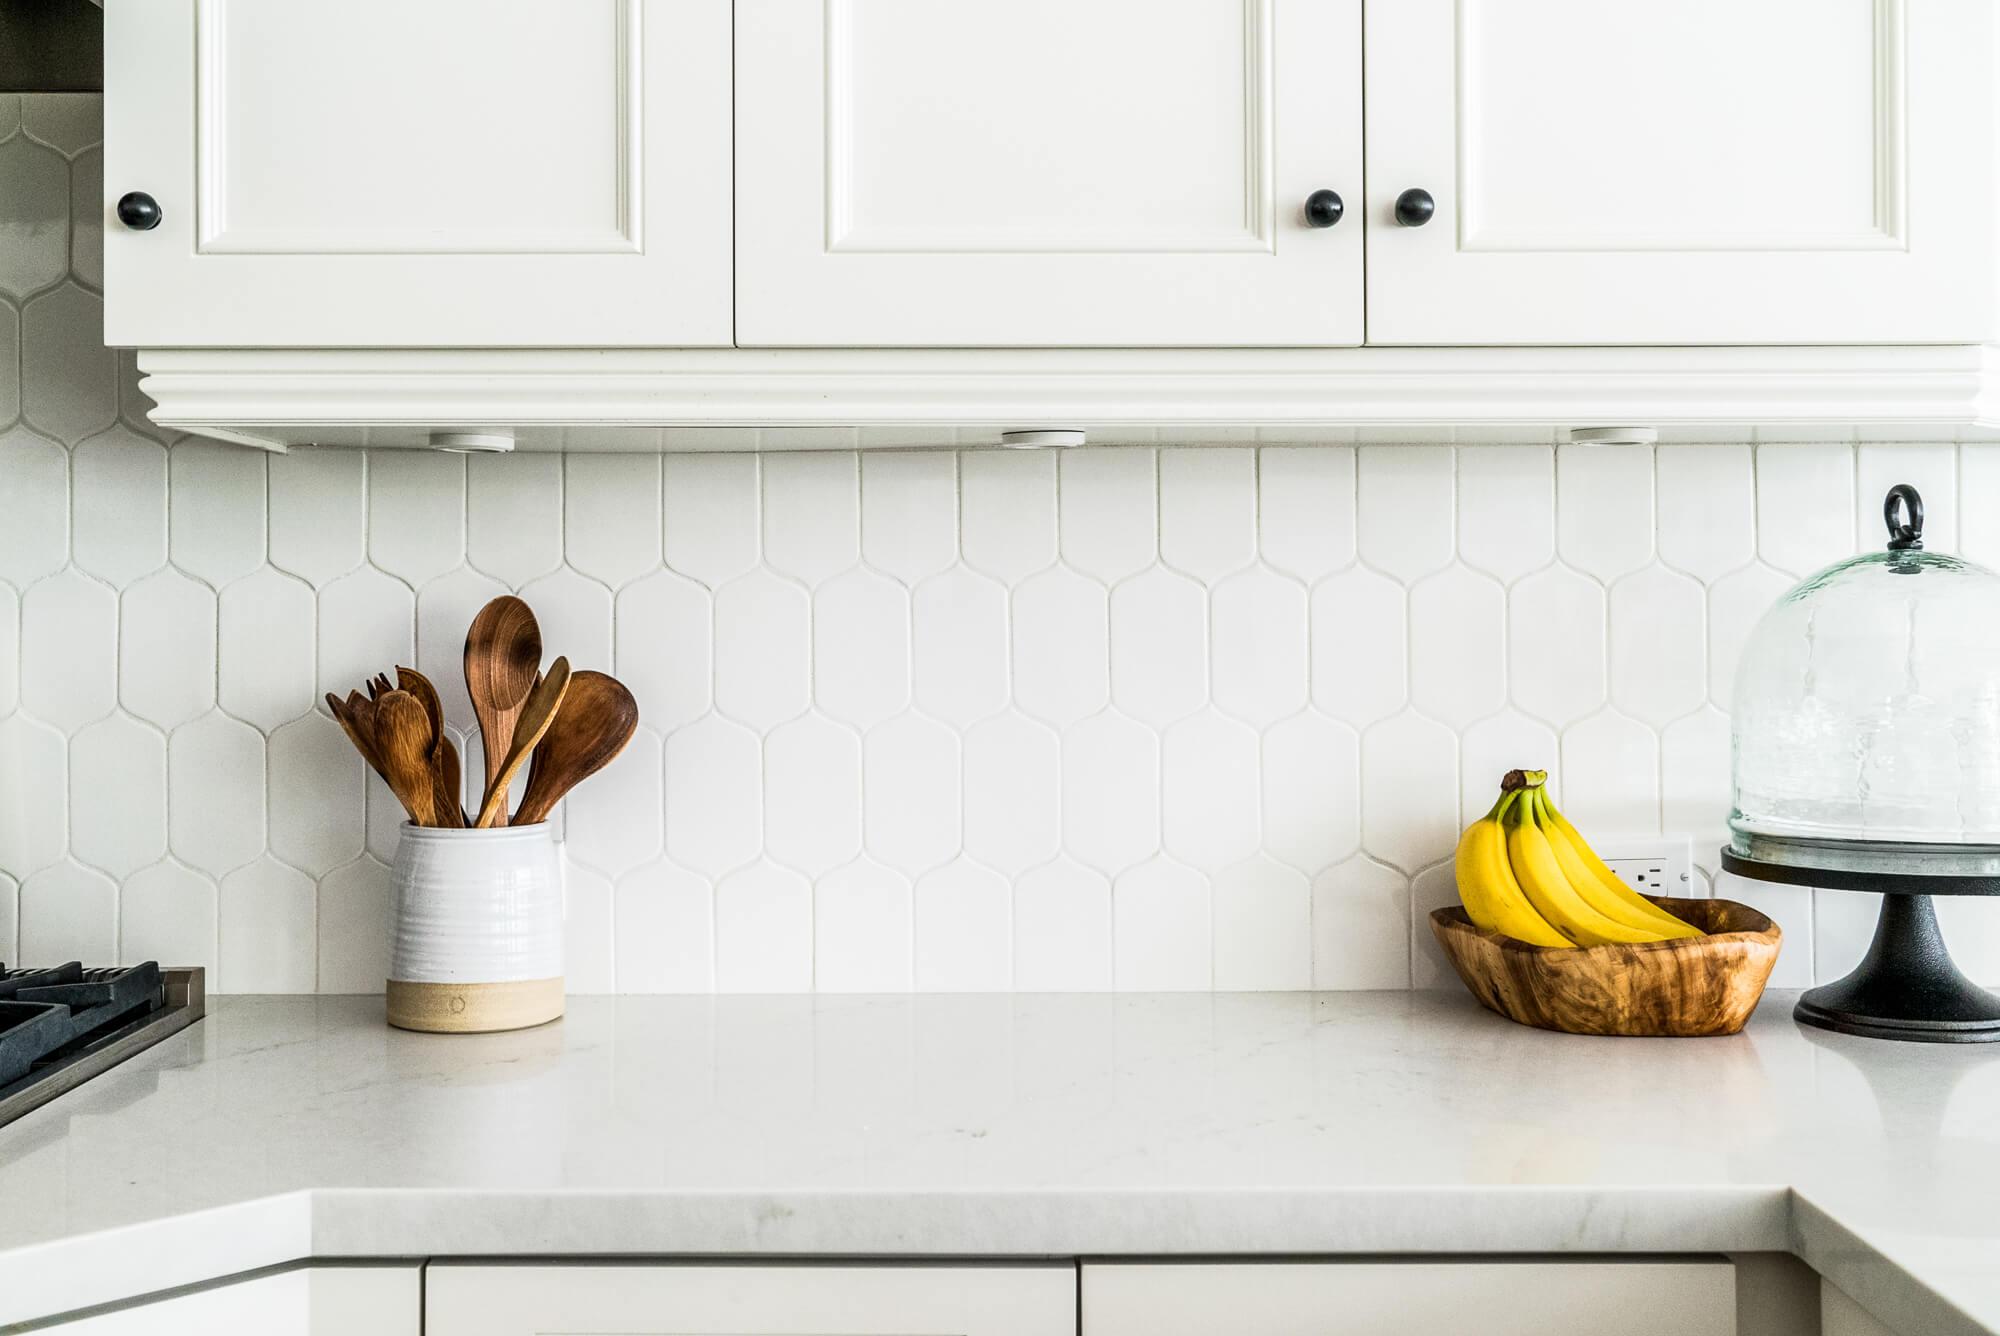 Kitchen Backsplash and Countertop Inspiration, Kitchen Remodel Orange County, Backspash Detail